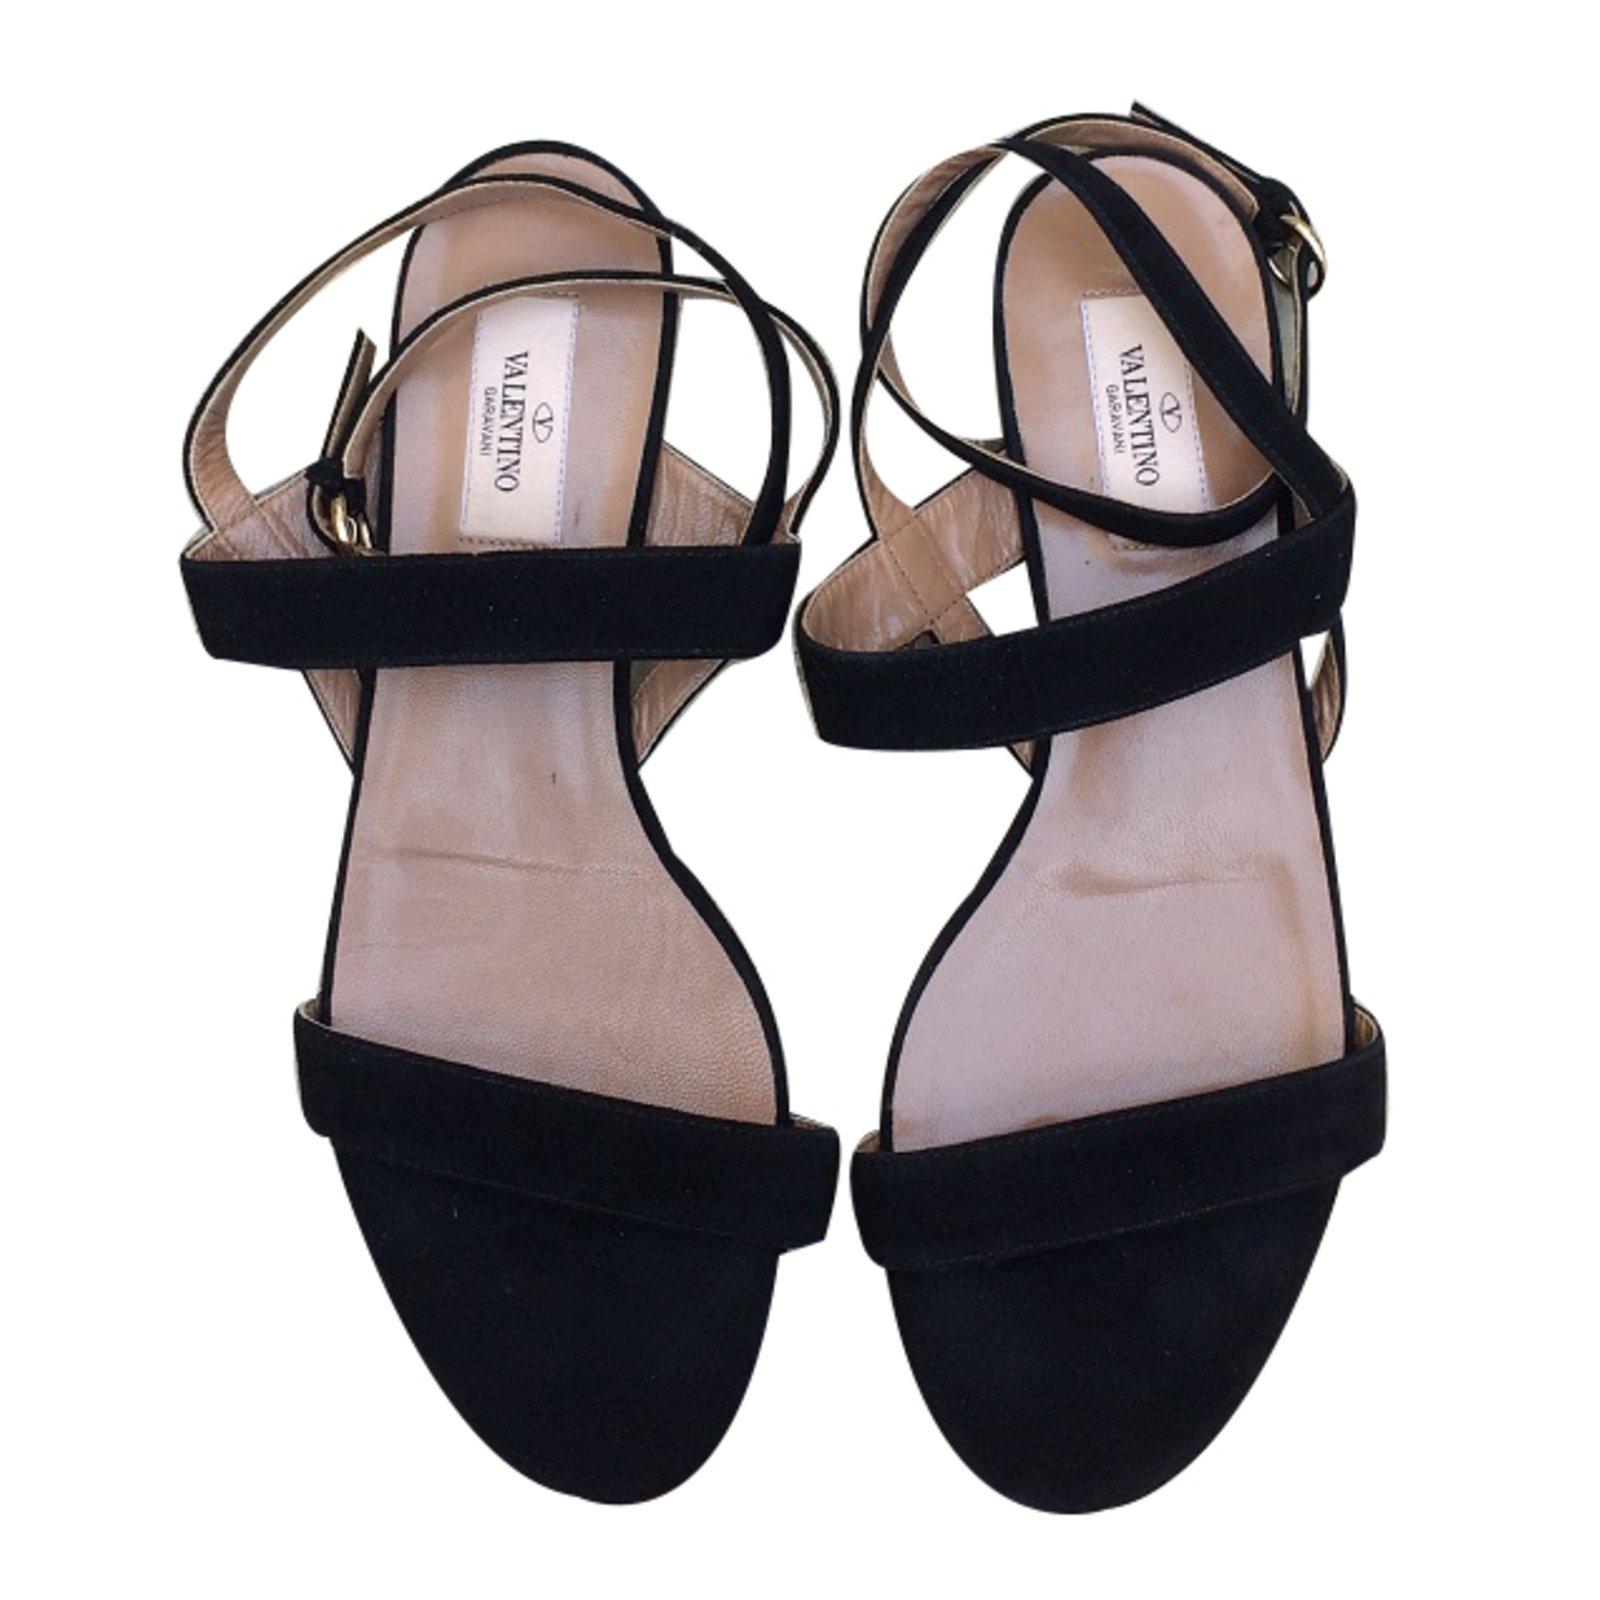 5d5bd678c8e Valentino Garavani Sandals Sandals Leather Black ref.36920 - Joli Closet